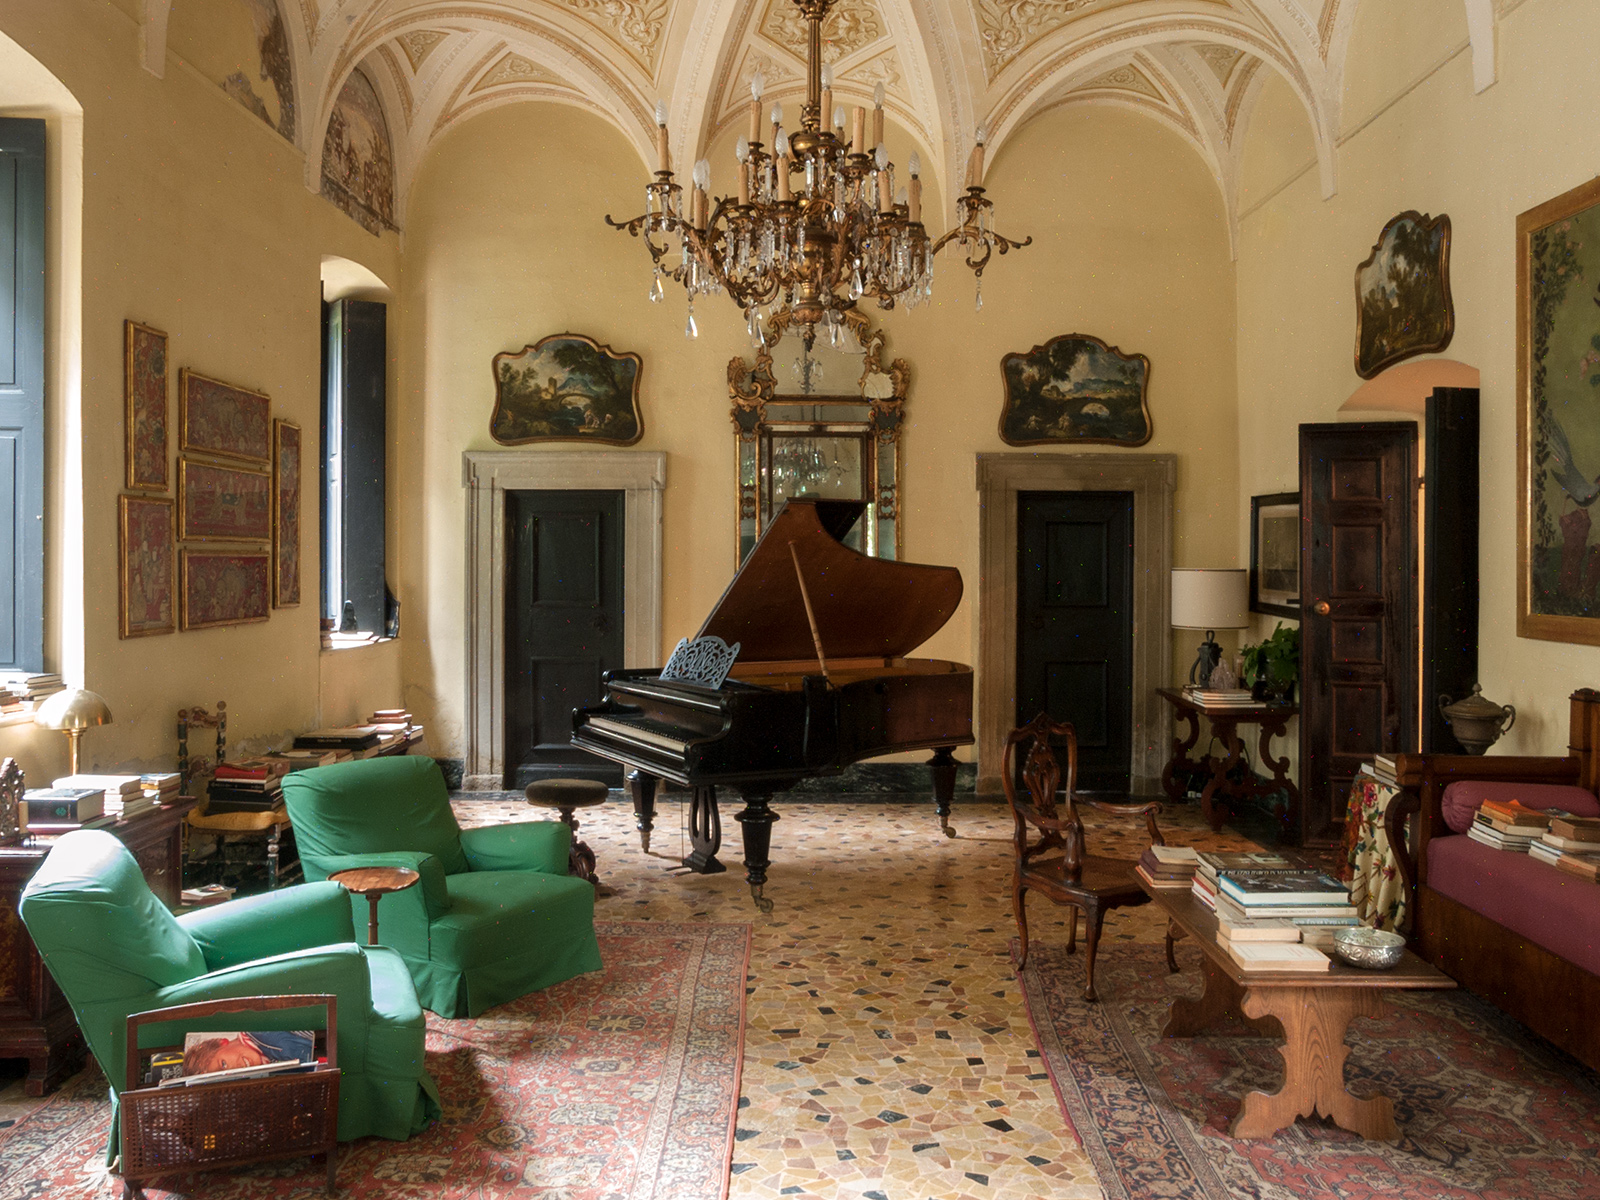 The salon. Photography: Giulio Ghirardi